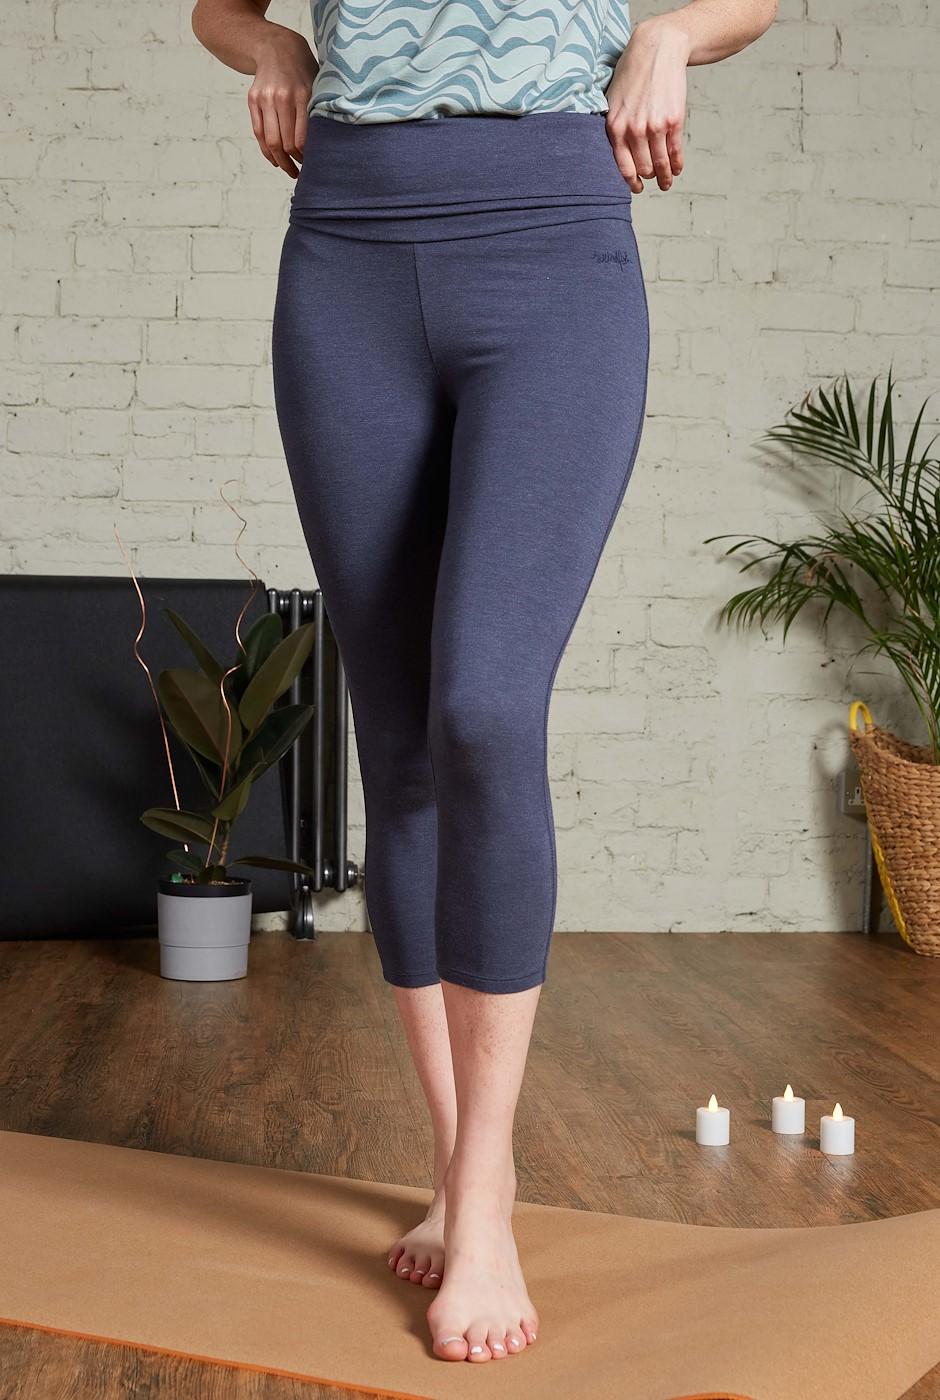 Aleski Bamboo Yoga Leggings Navy Marl